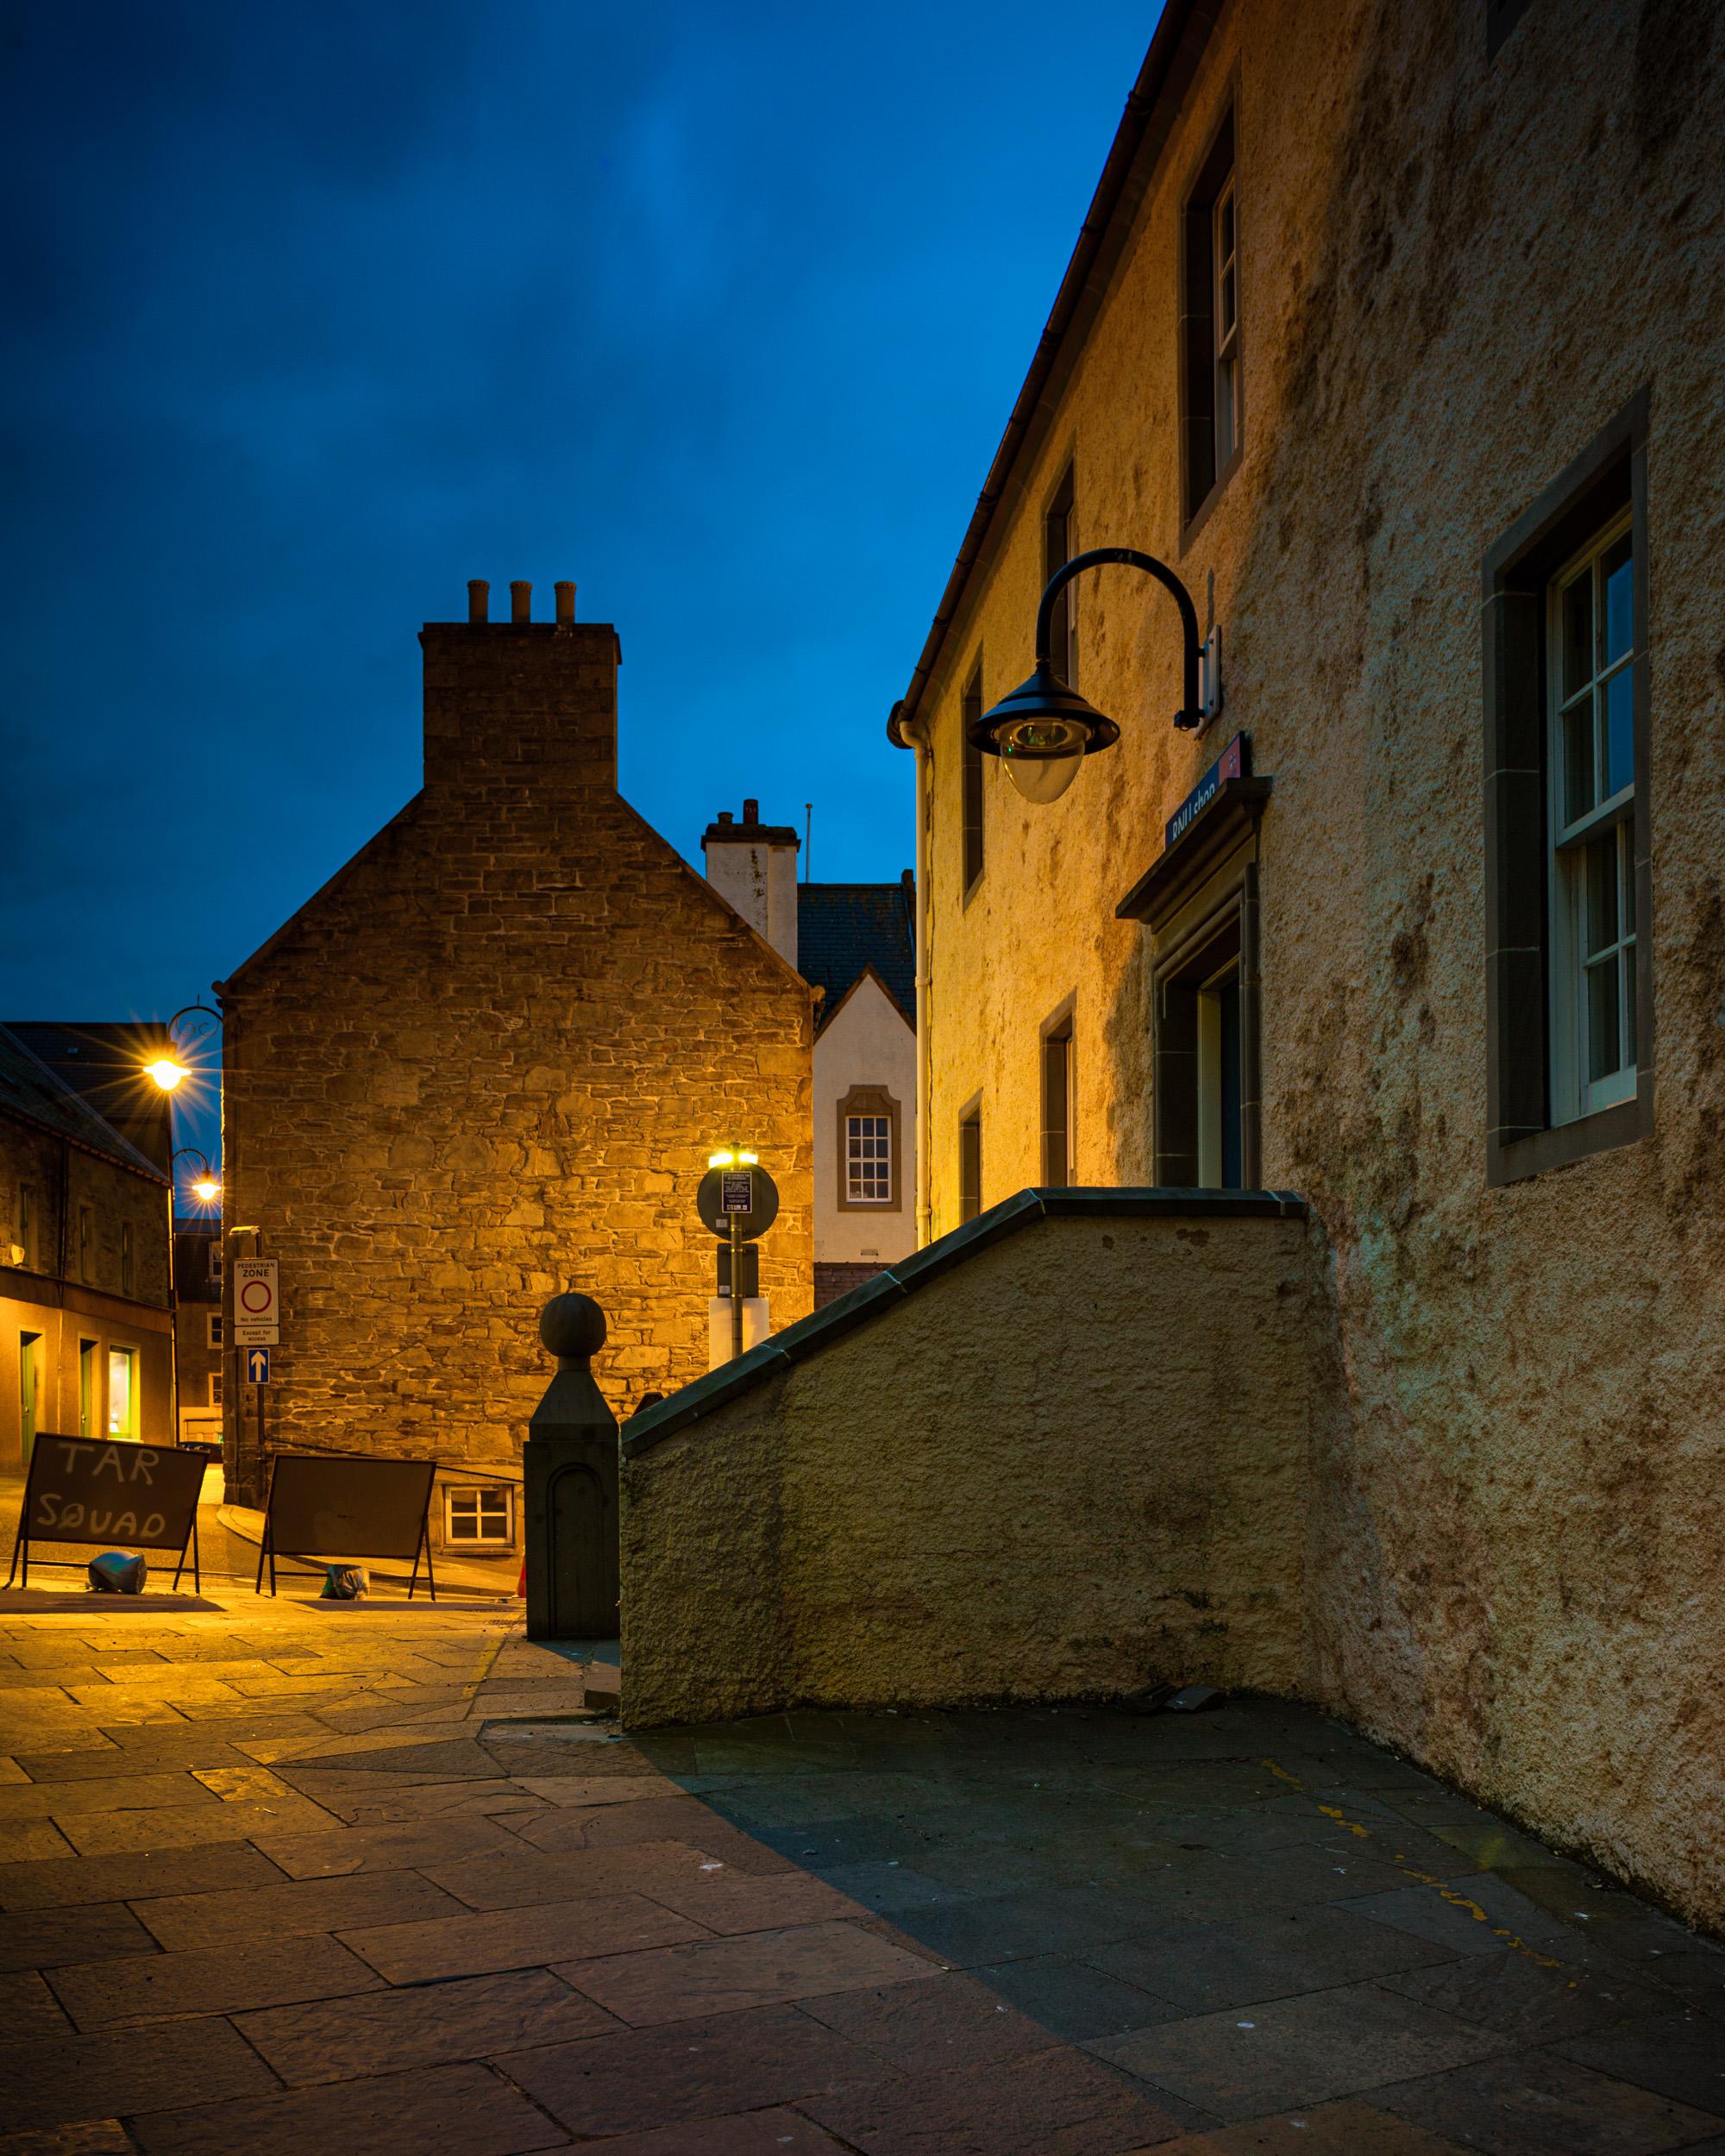 Lerwick, Shetland, Scotland. Canon 5D Mark II, Zuiko Shift 24mm f/3.5 lens. 10 seconds, f/8, ISO 100.